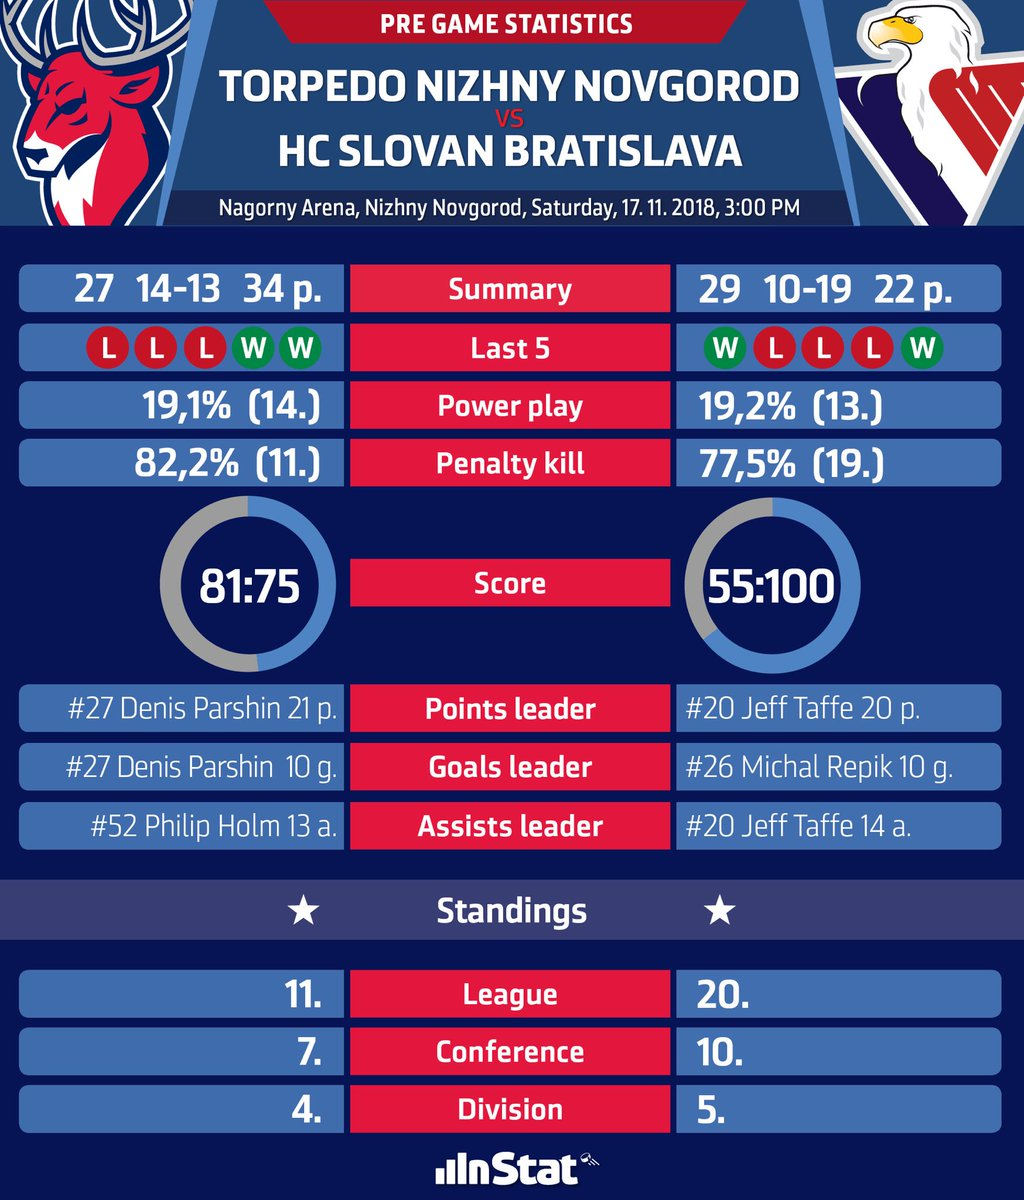 Pregame stats and match up info @torpedonn vs #hcslovan. Face off time today 3:00 pm CET @khl #vernislovanu https://t.co/AbGLx16YOD